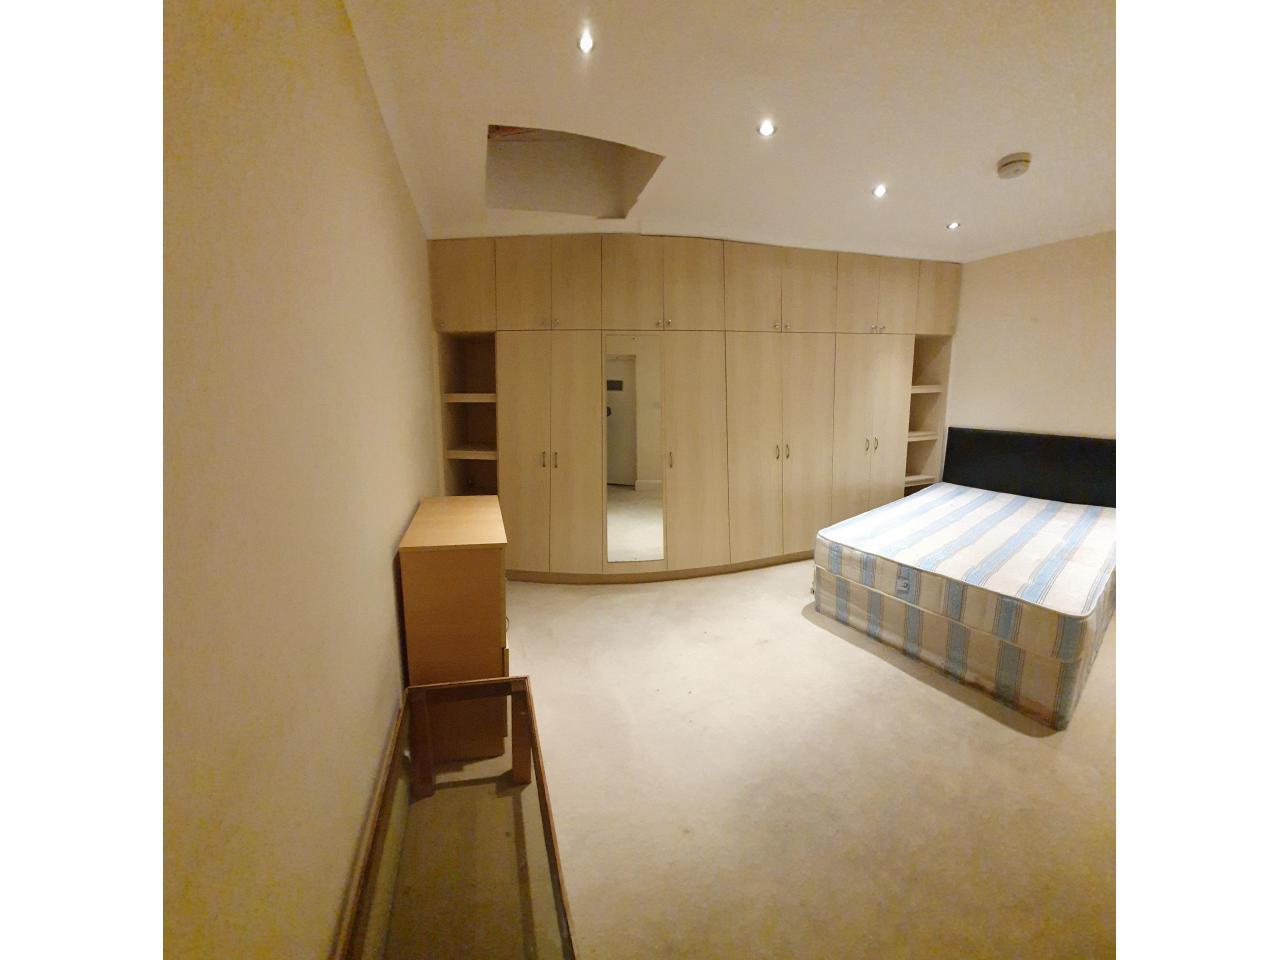 Сингл и Дабл комнаты в аренду на Neasden / Sudbury Hill / Harrow / Greenford. - 1